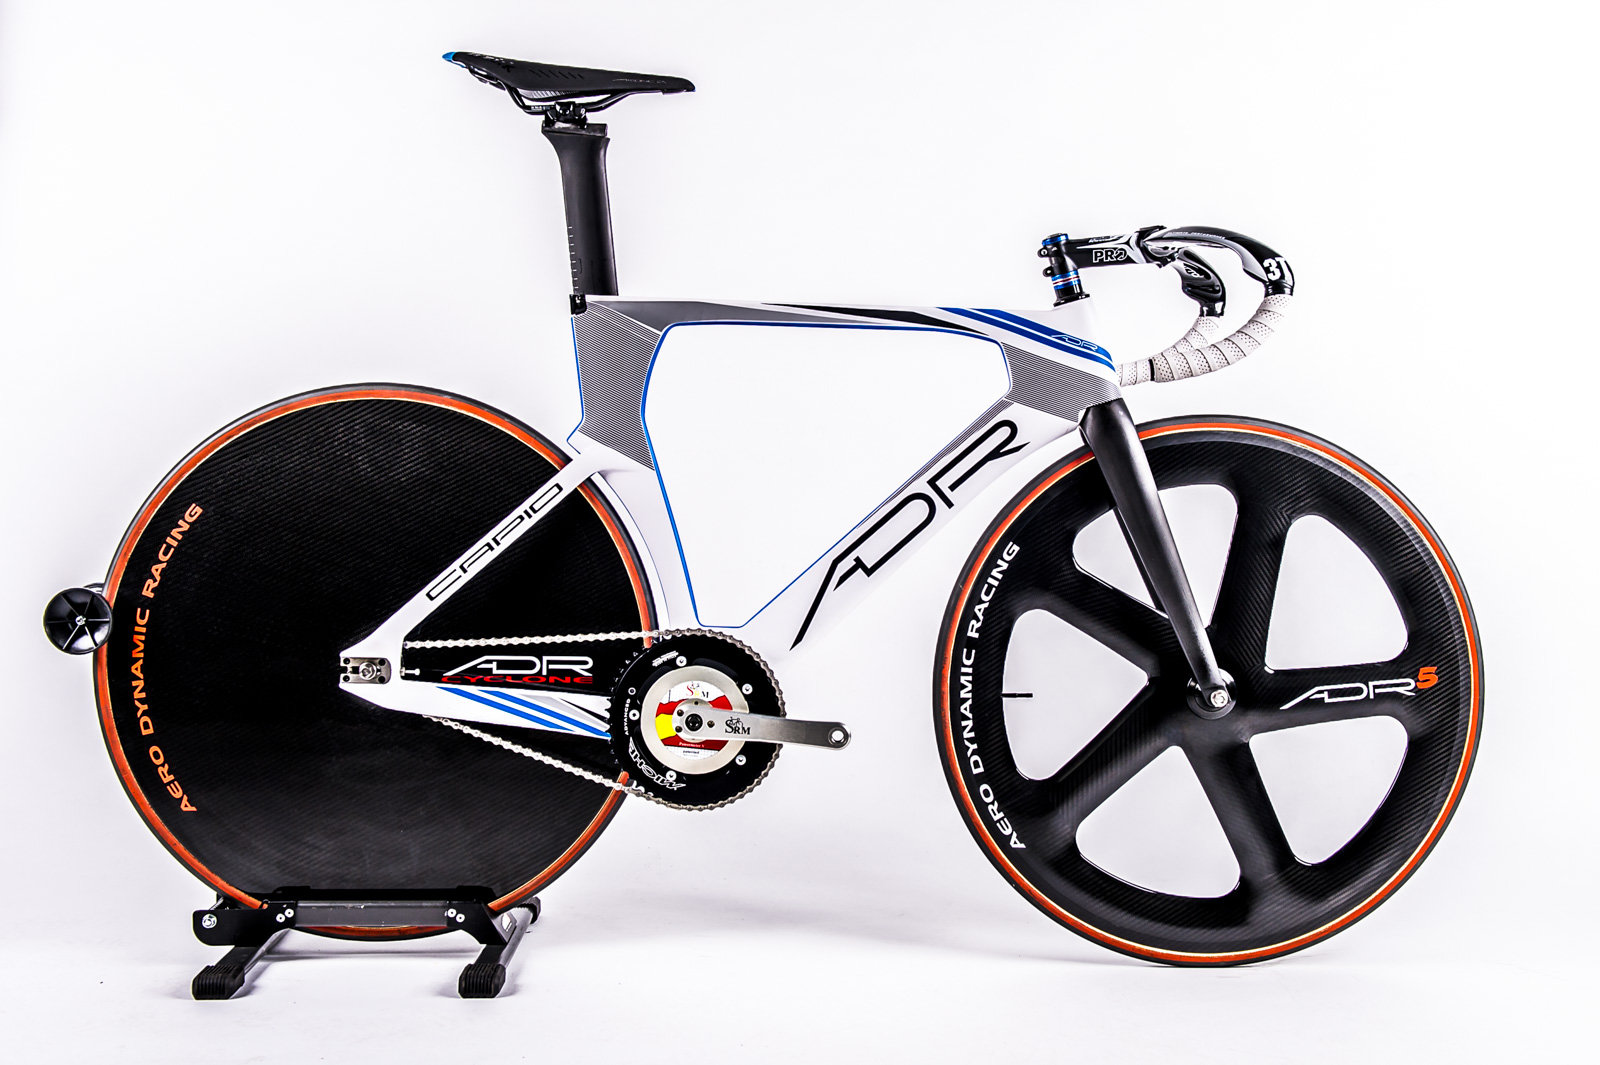 ADR Capio track bike